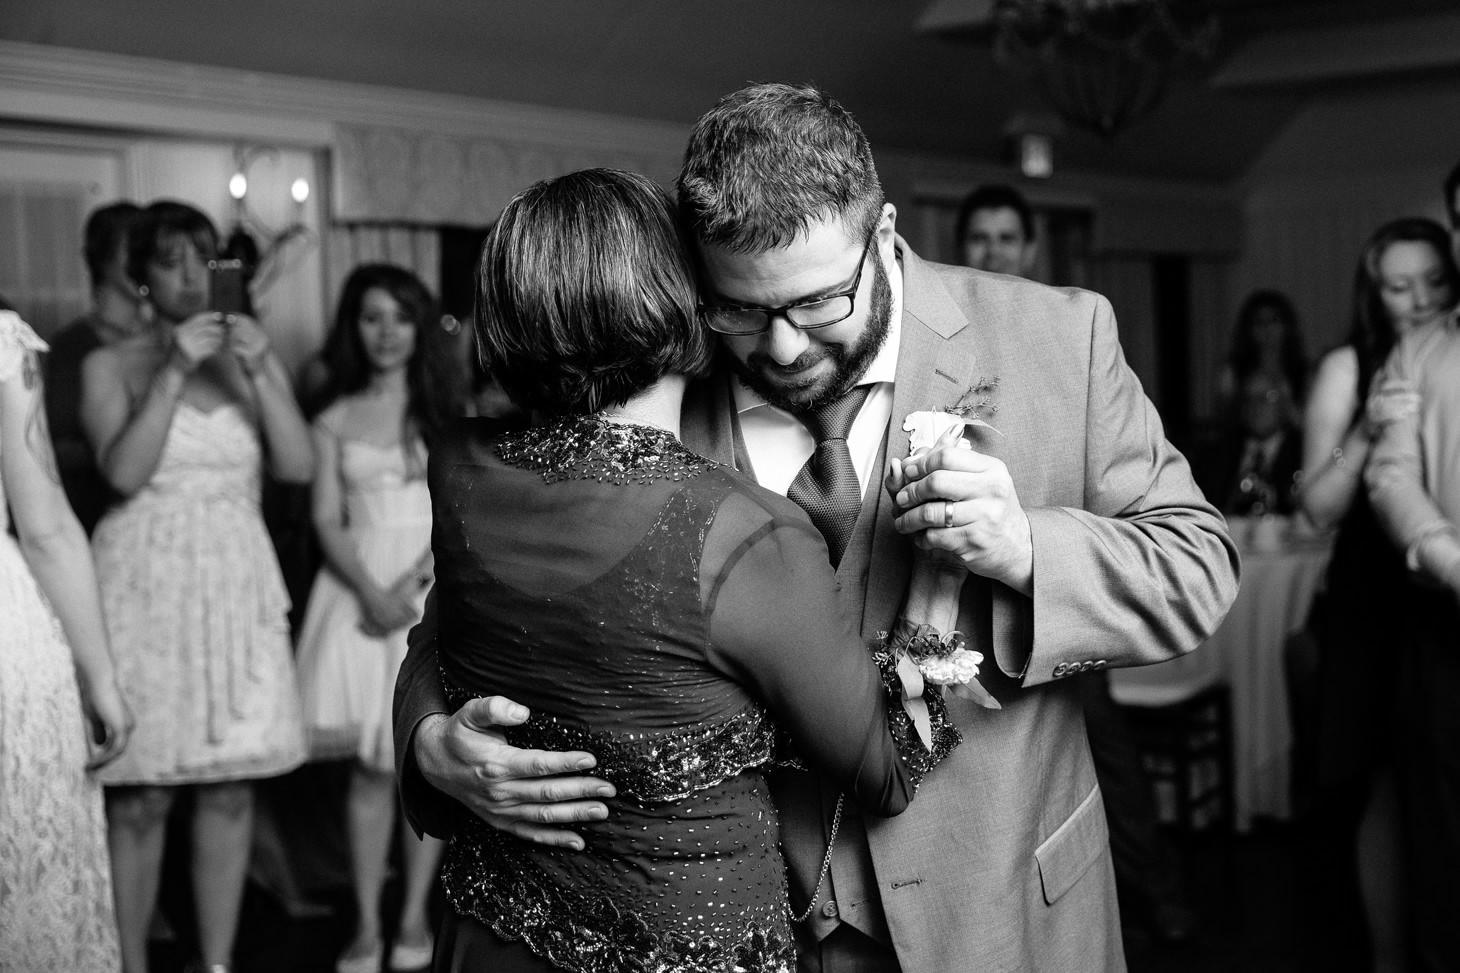 nyc-long-island-wedding-photographer-three-village-inn-smitten-chickens46.jpg